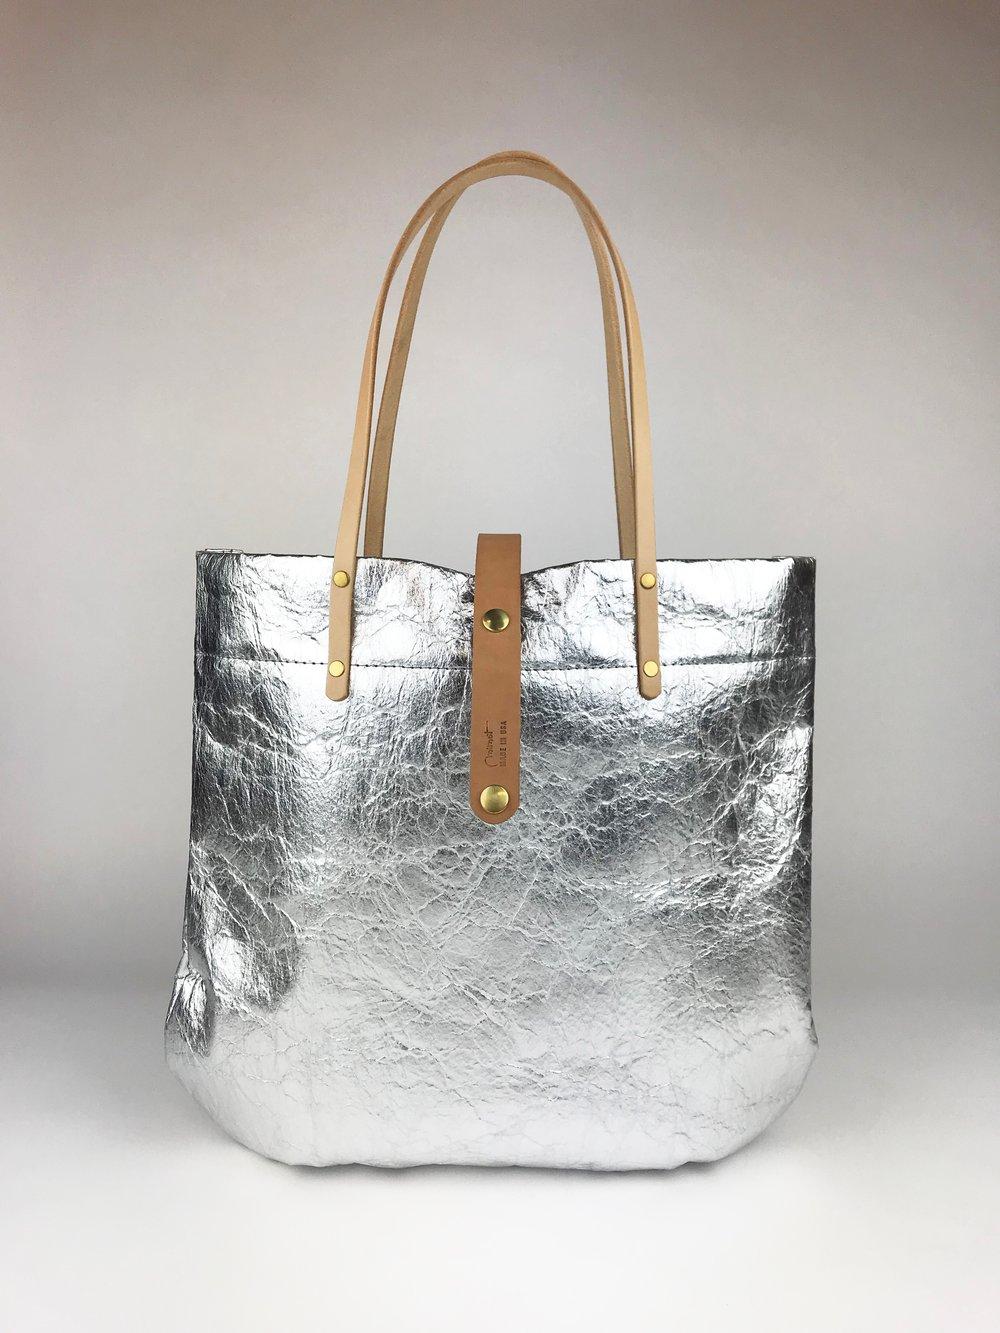 Image of Metallic Market Tote, Silver